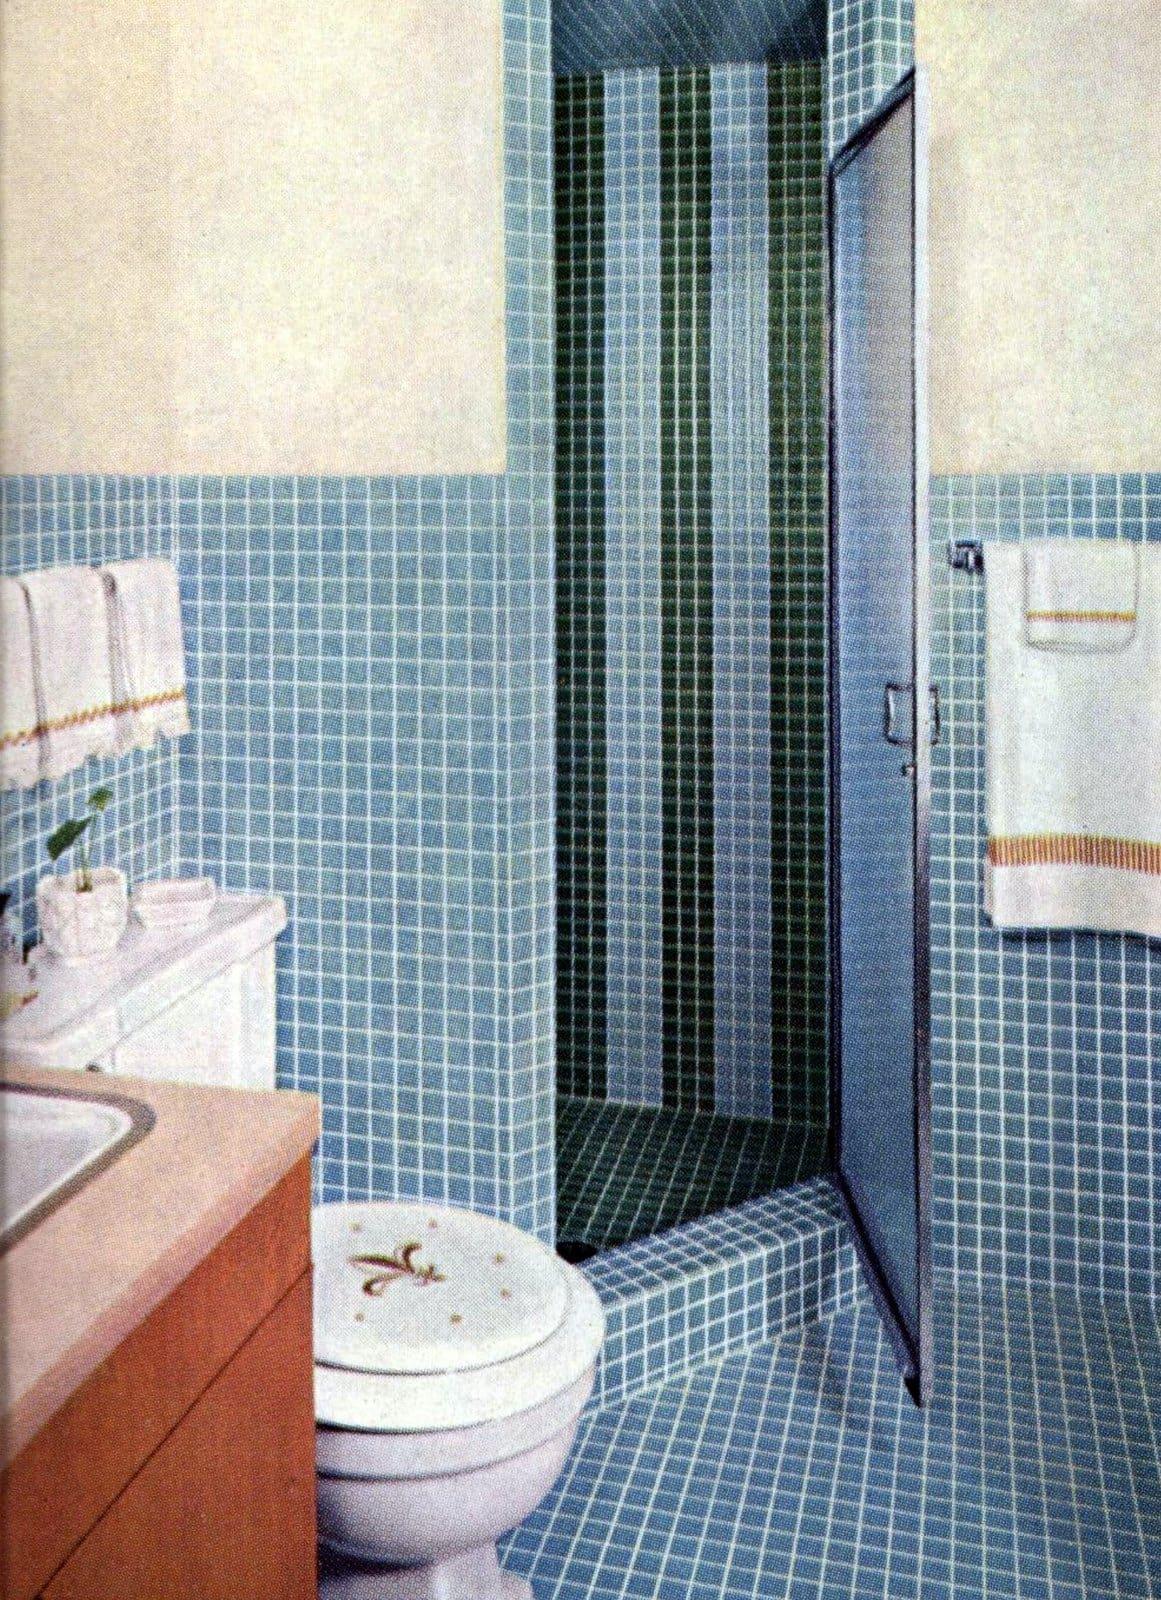 Vintage 60s light blue small square mosaic tile on bathroom walls, stall, floor